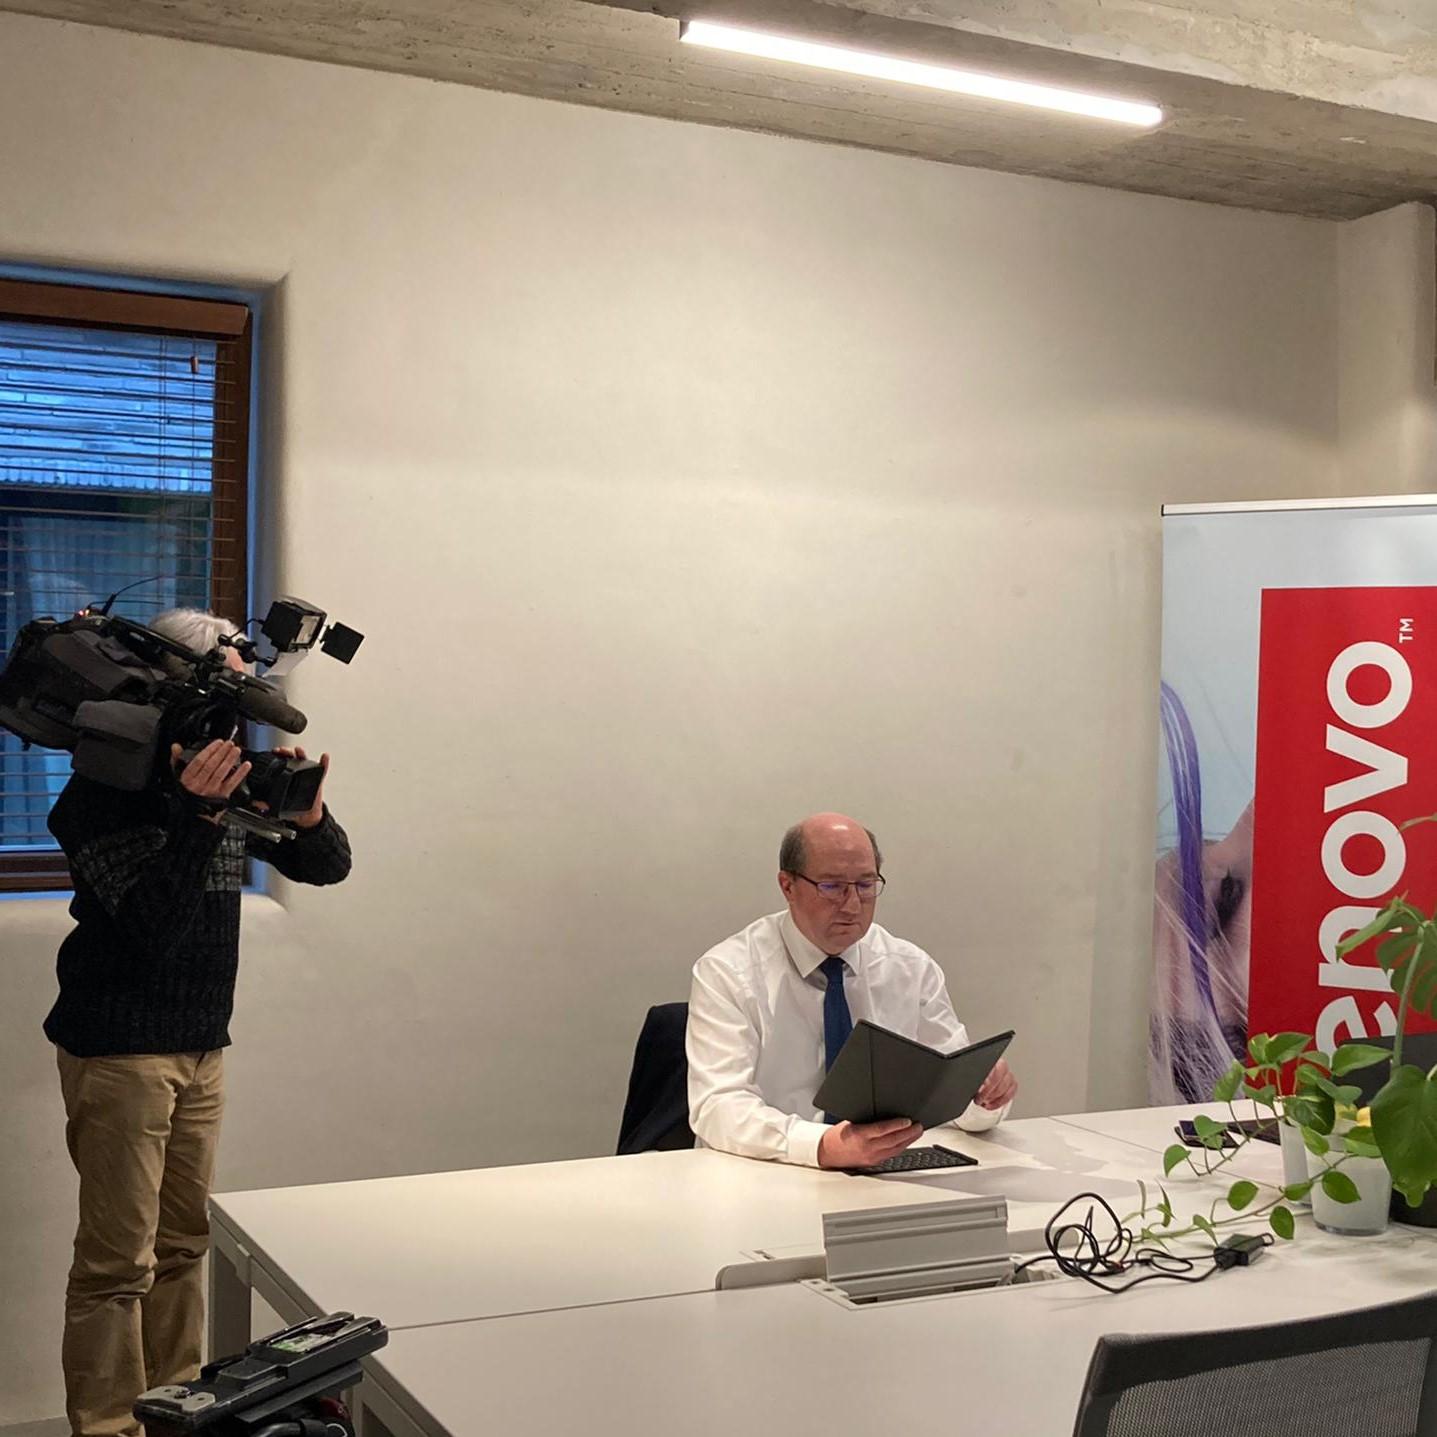 Lenovo: Covid-proof briefings for ThinkPad X1 Fold - Public Relations (PR)